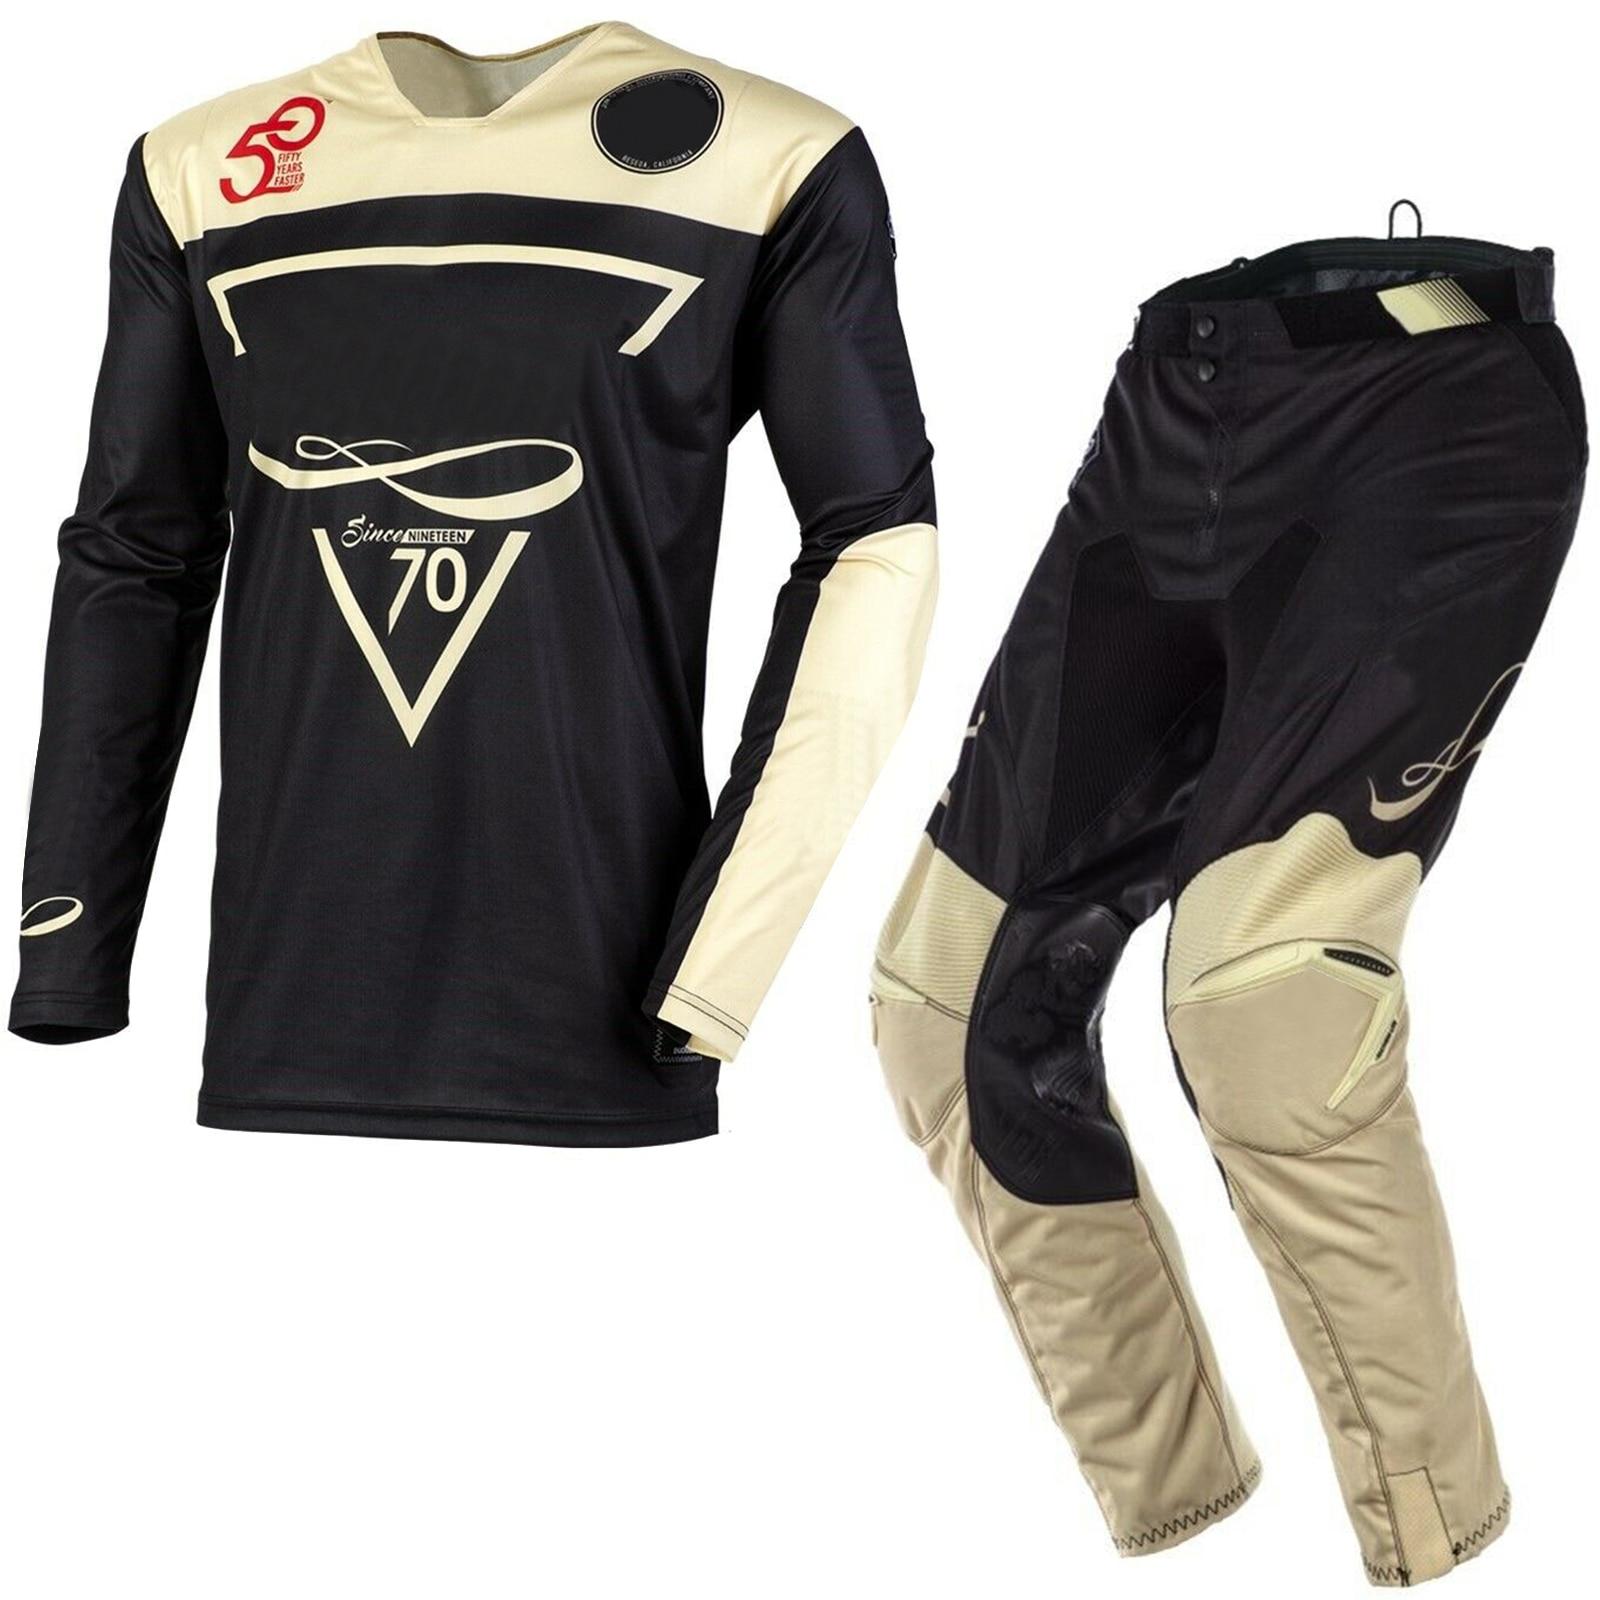 Jersey Pant MX Motocross Dirt Bike ATV Gear Shift Black Label Strike Combo